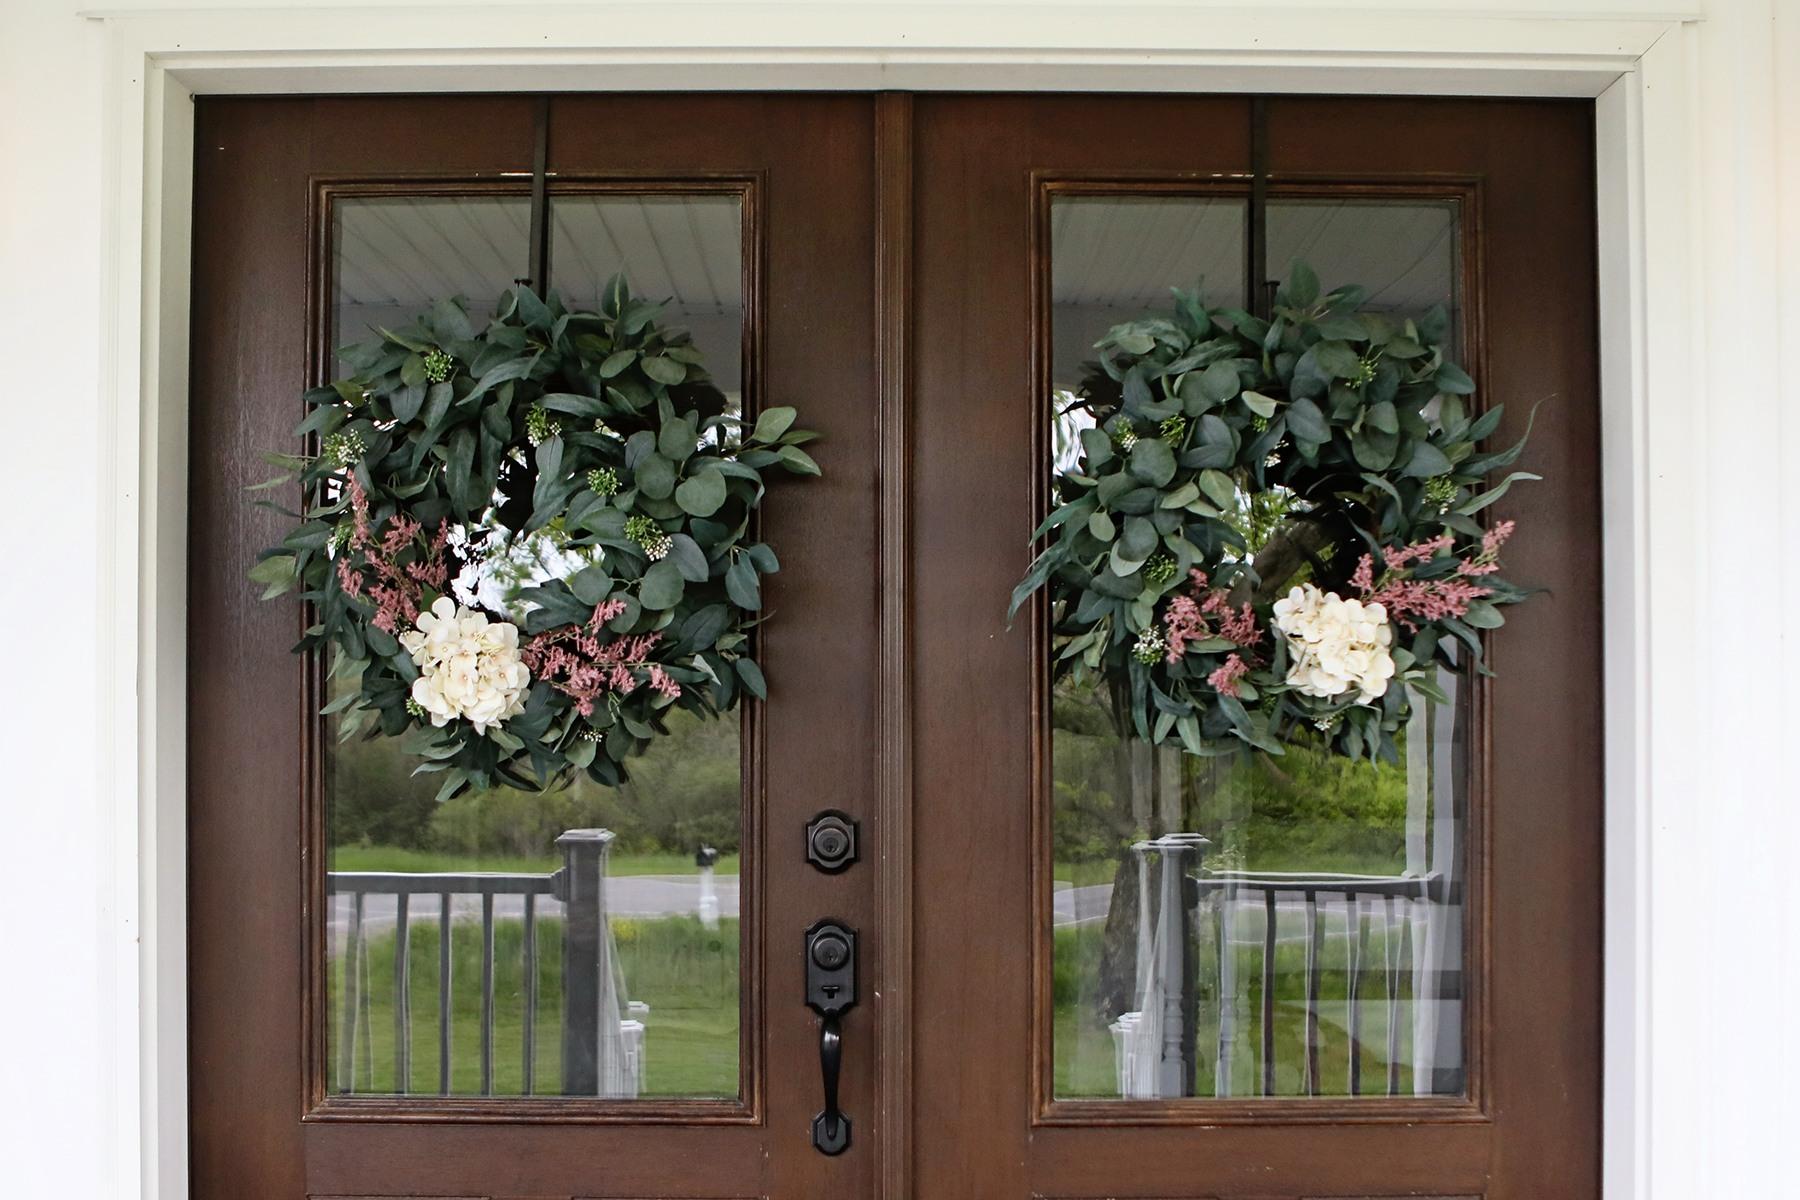 Hearth & Hand Eucalyptus Wreaths Update/Refresh